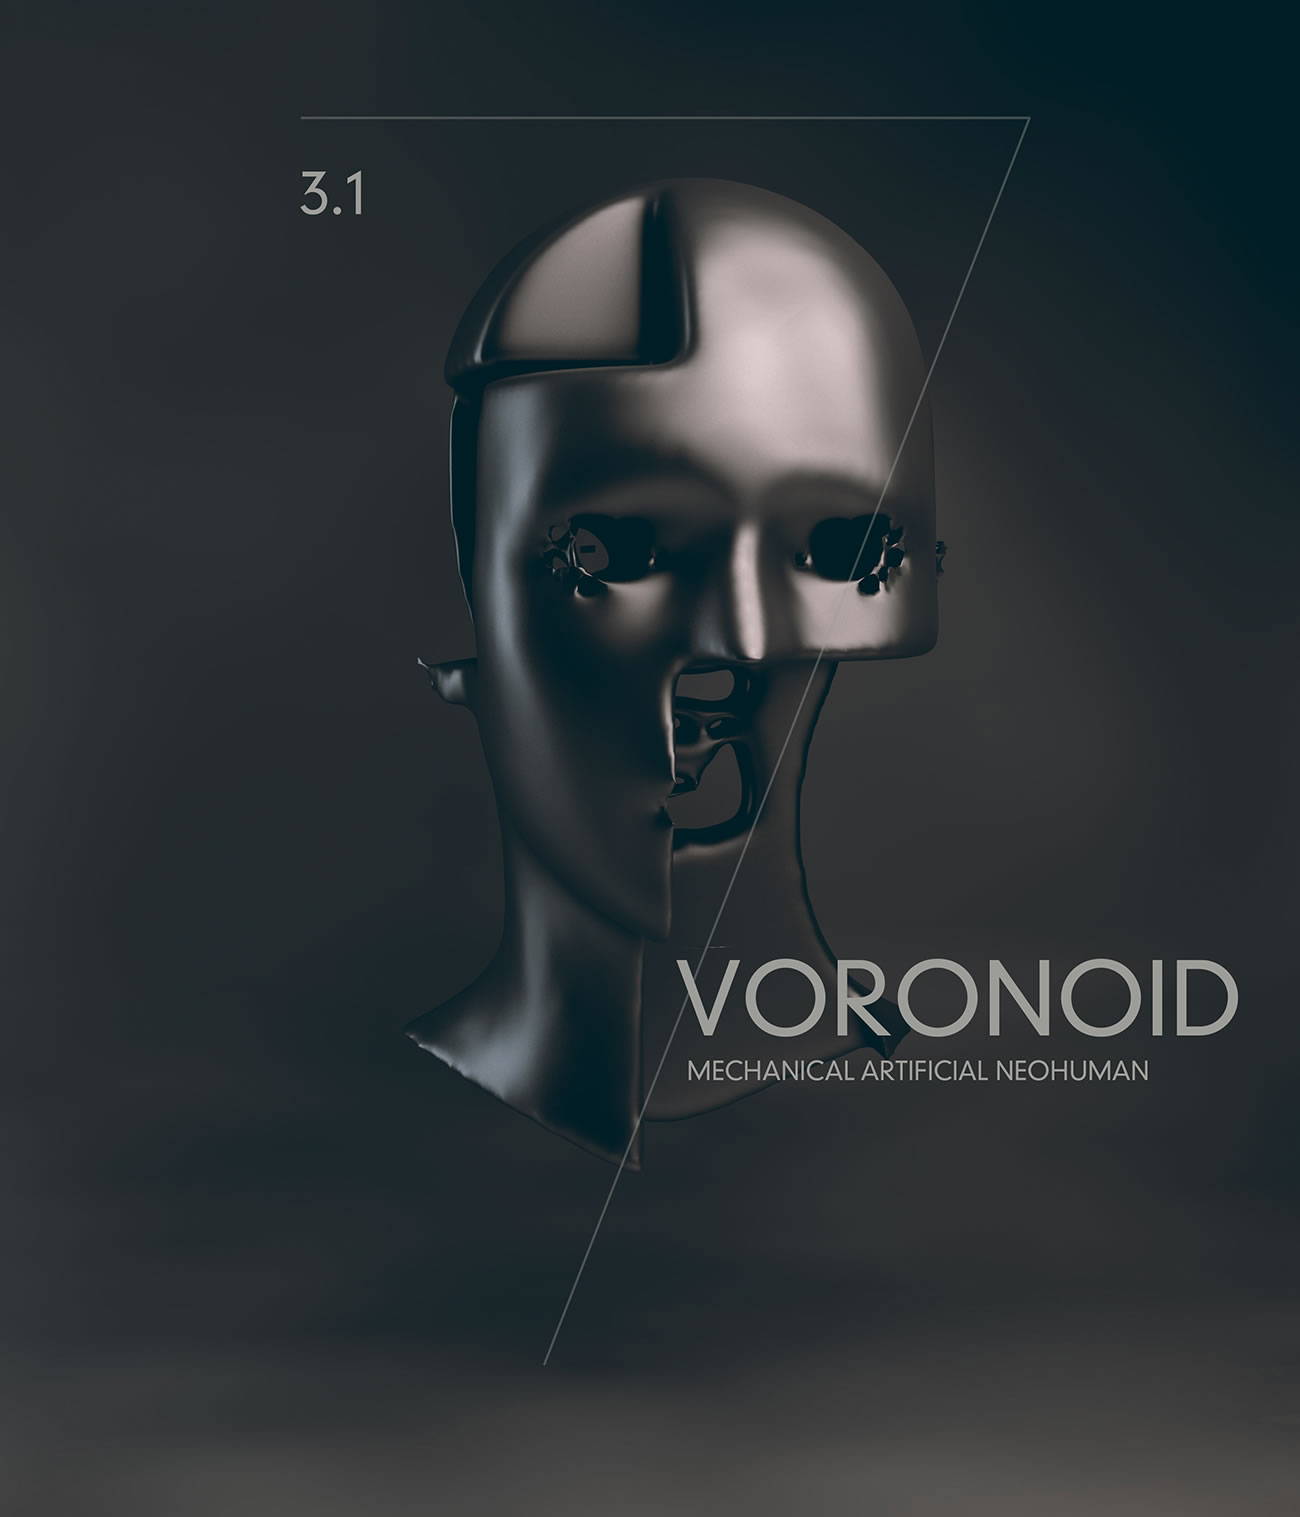 voronoid half face by Voronoid